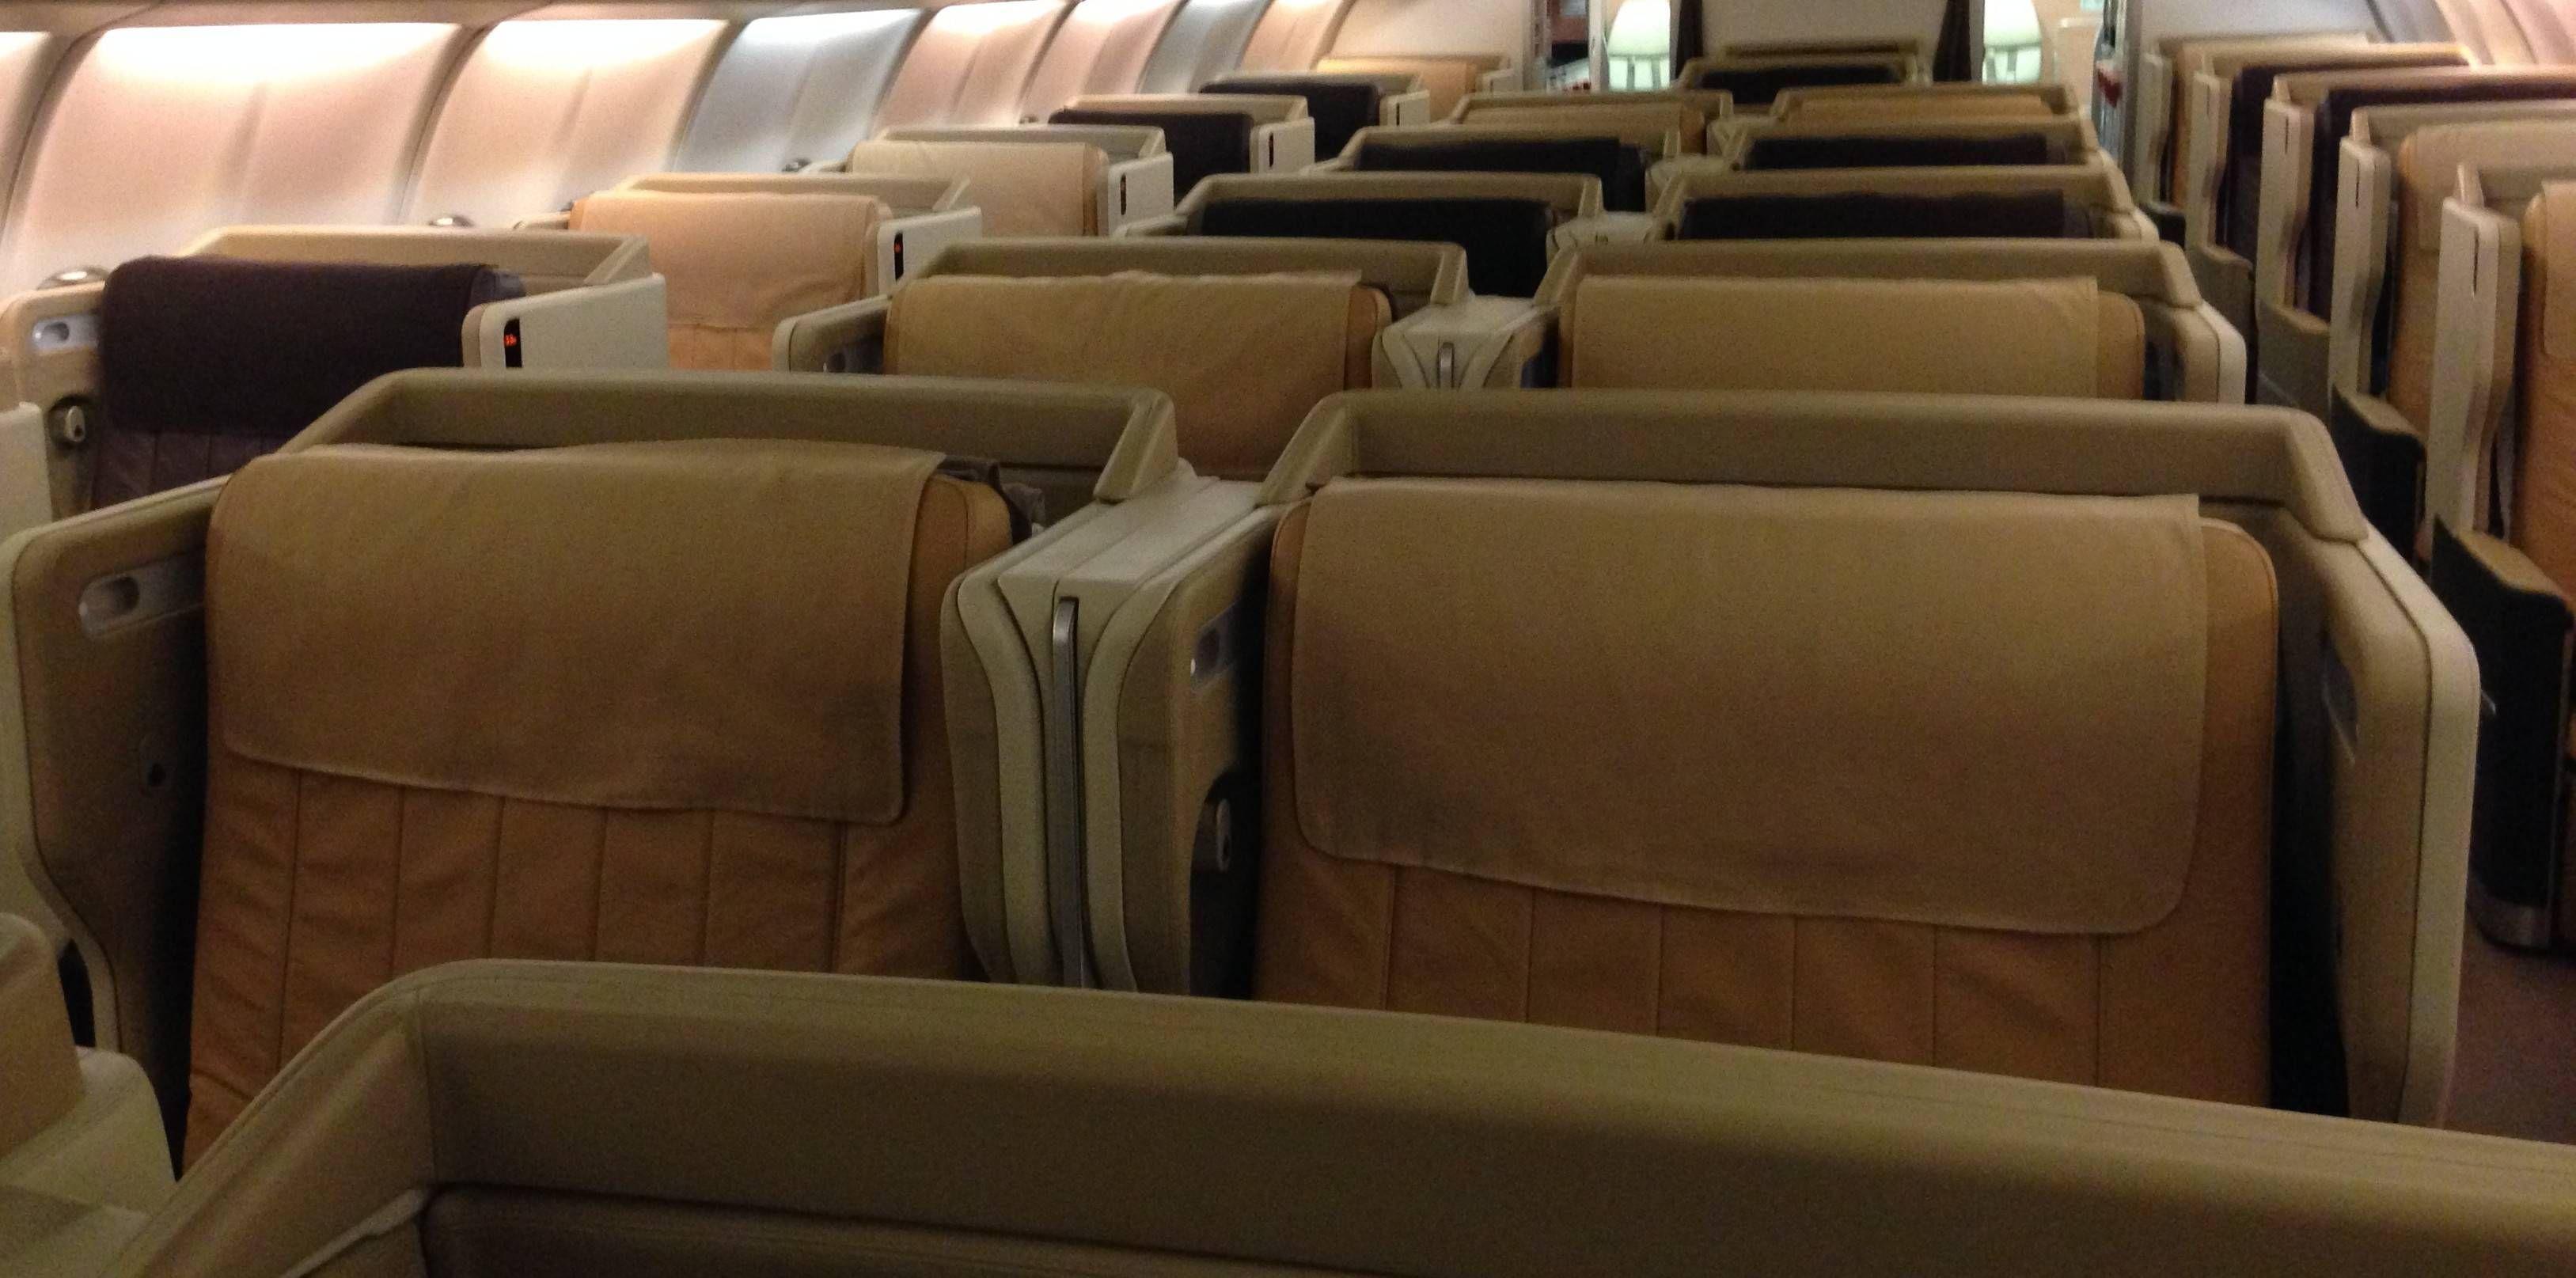 Classe Executiva da Singapore Airlines no Airbus A340 – All Business Class